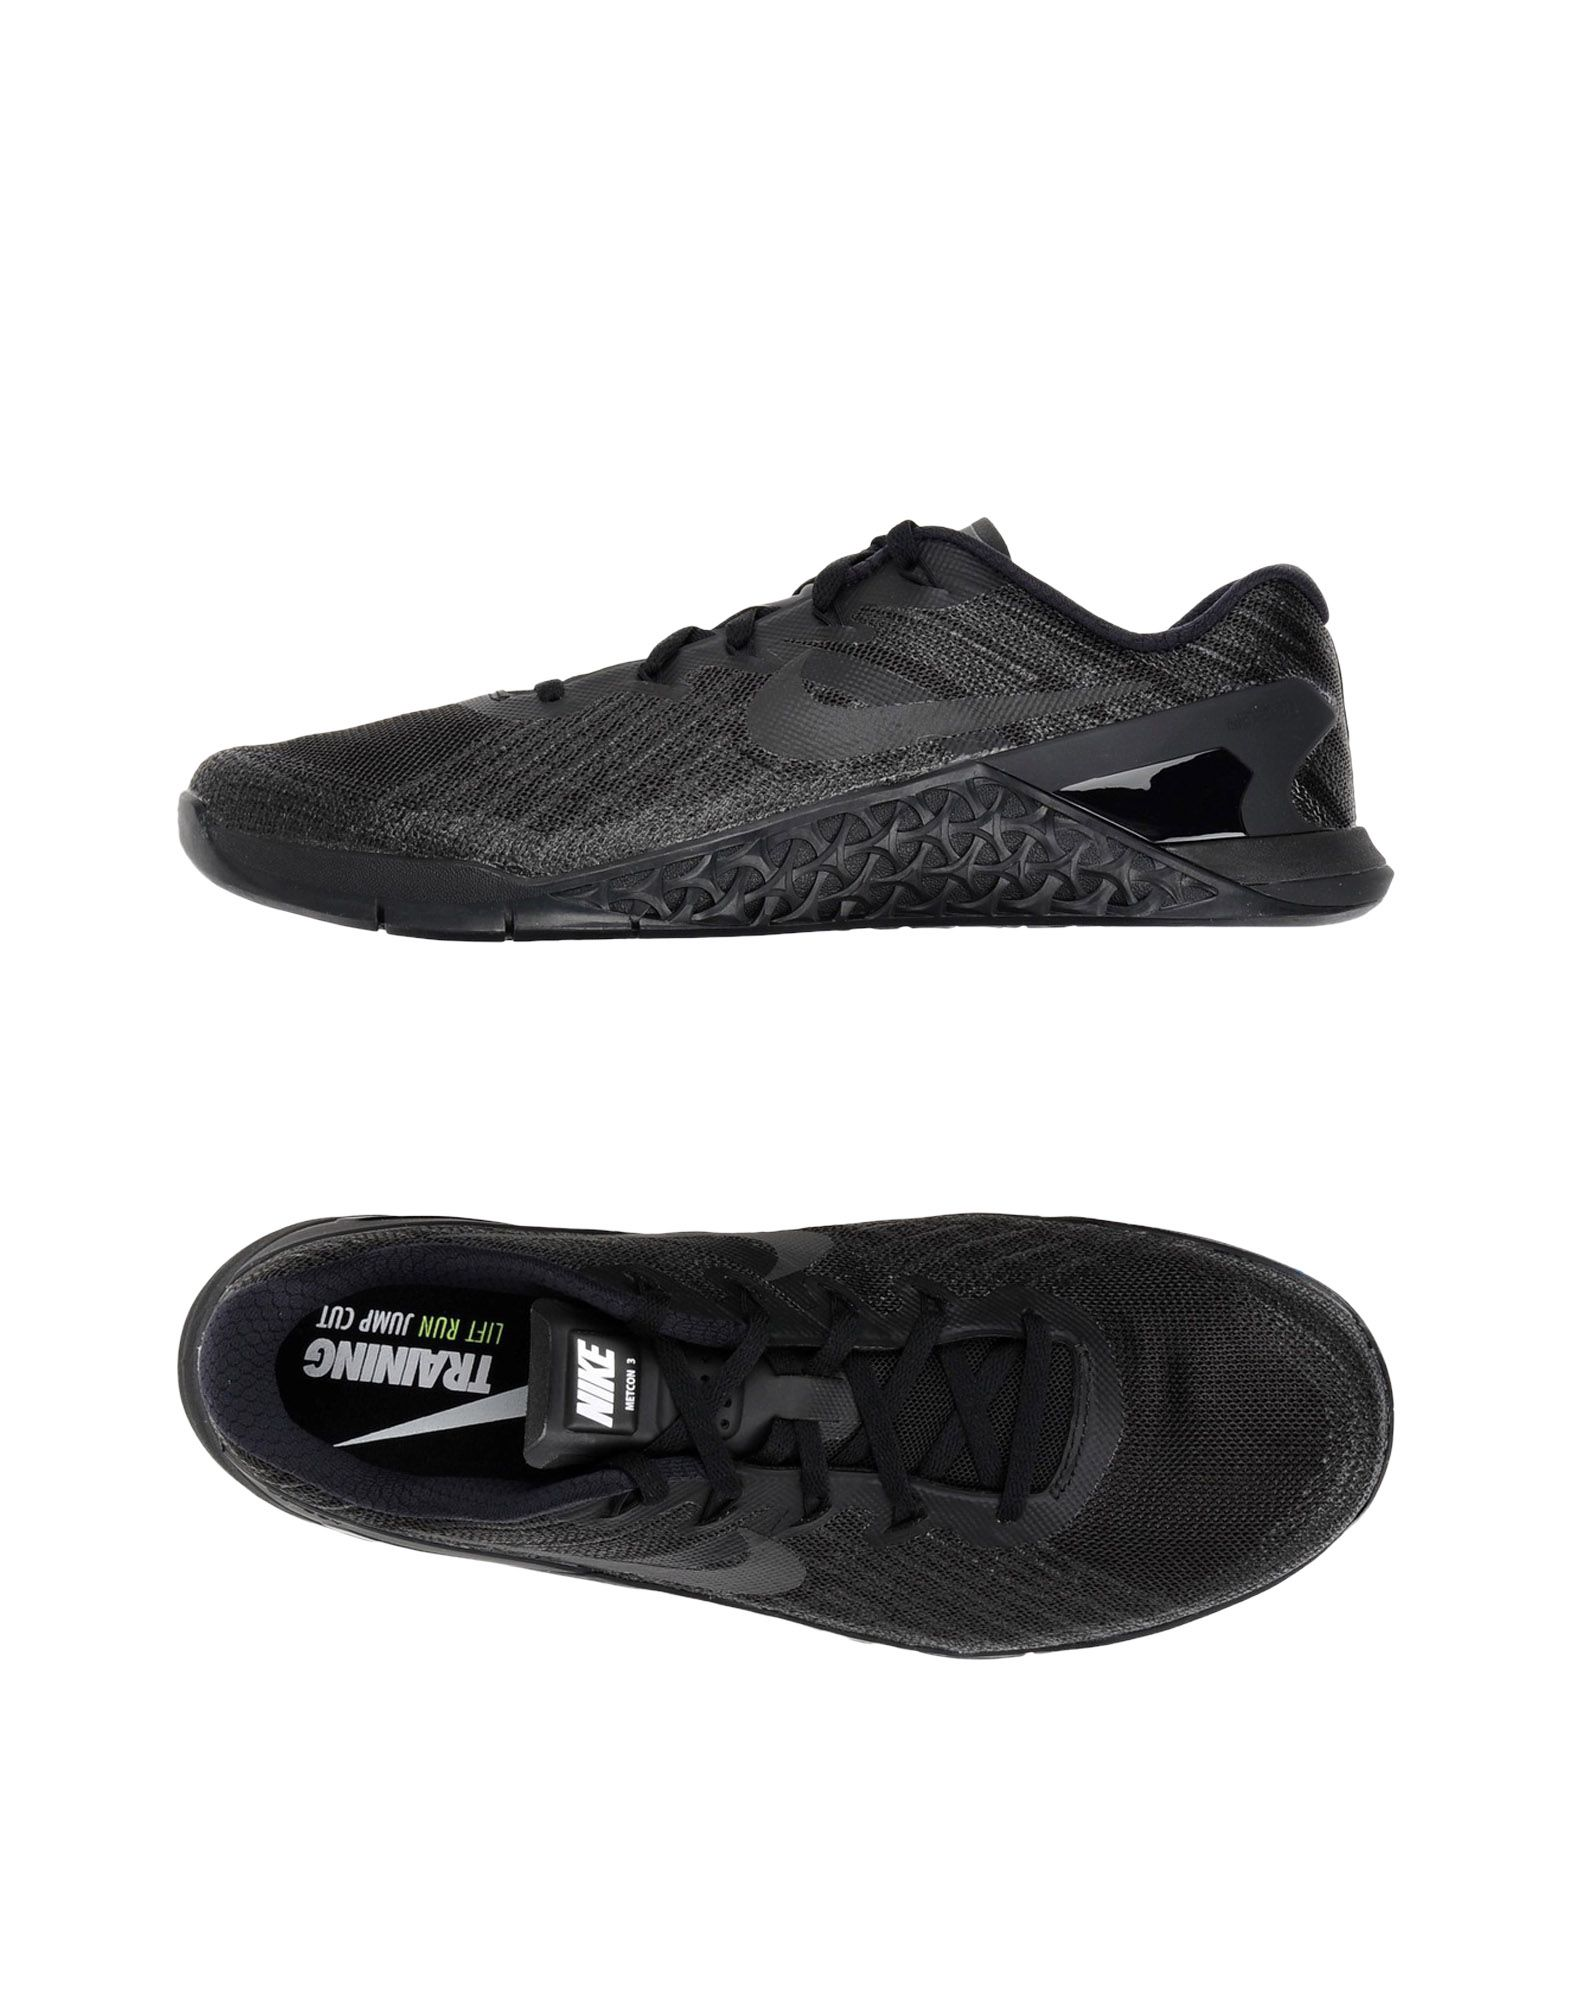 Nike   Metcon 3  11376668KK Neue Schuhe